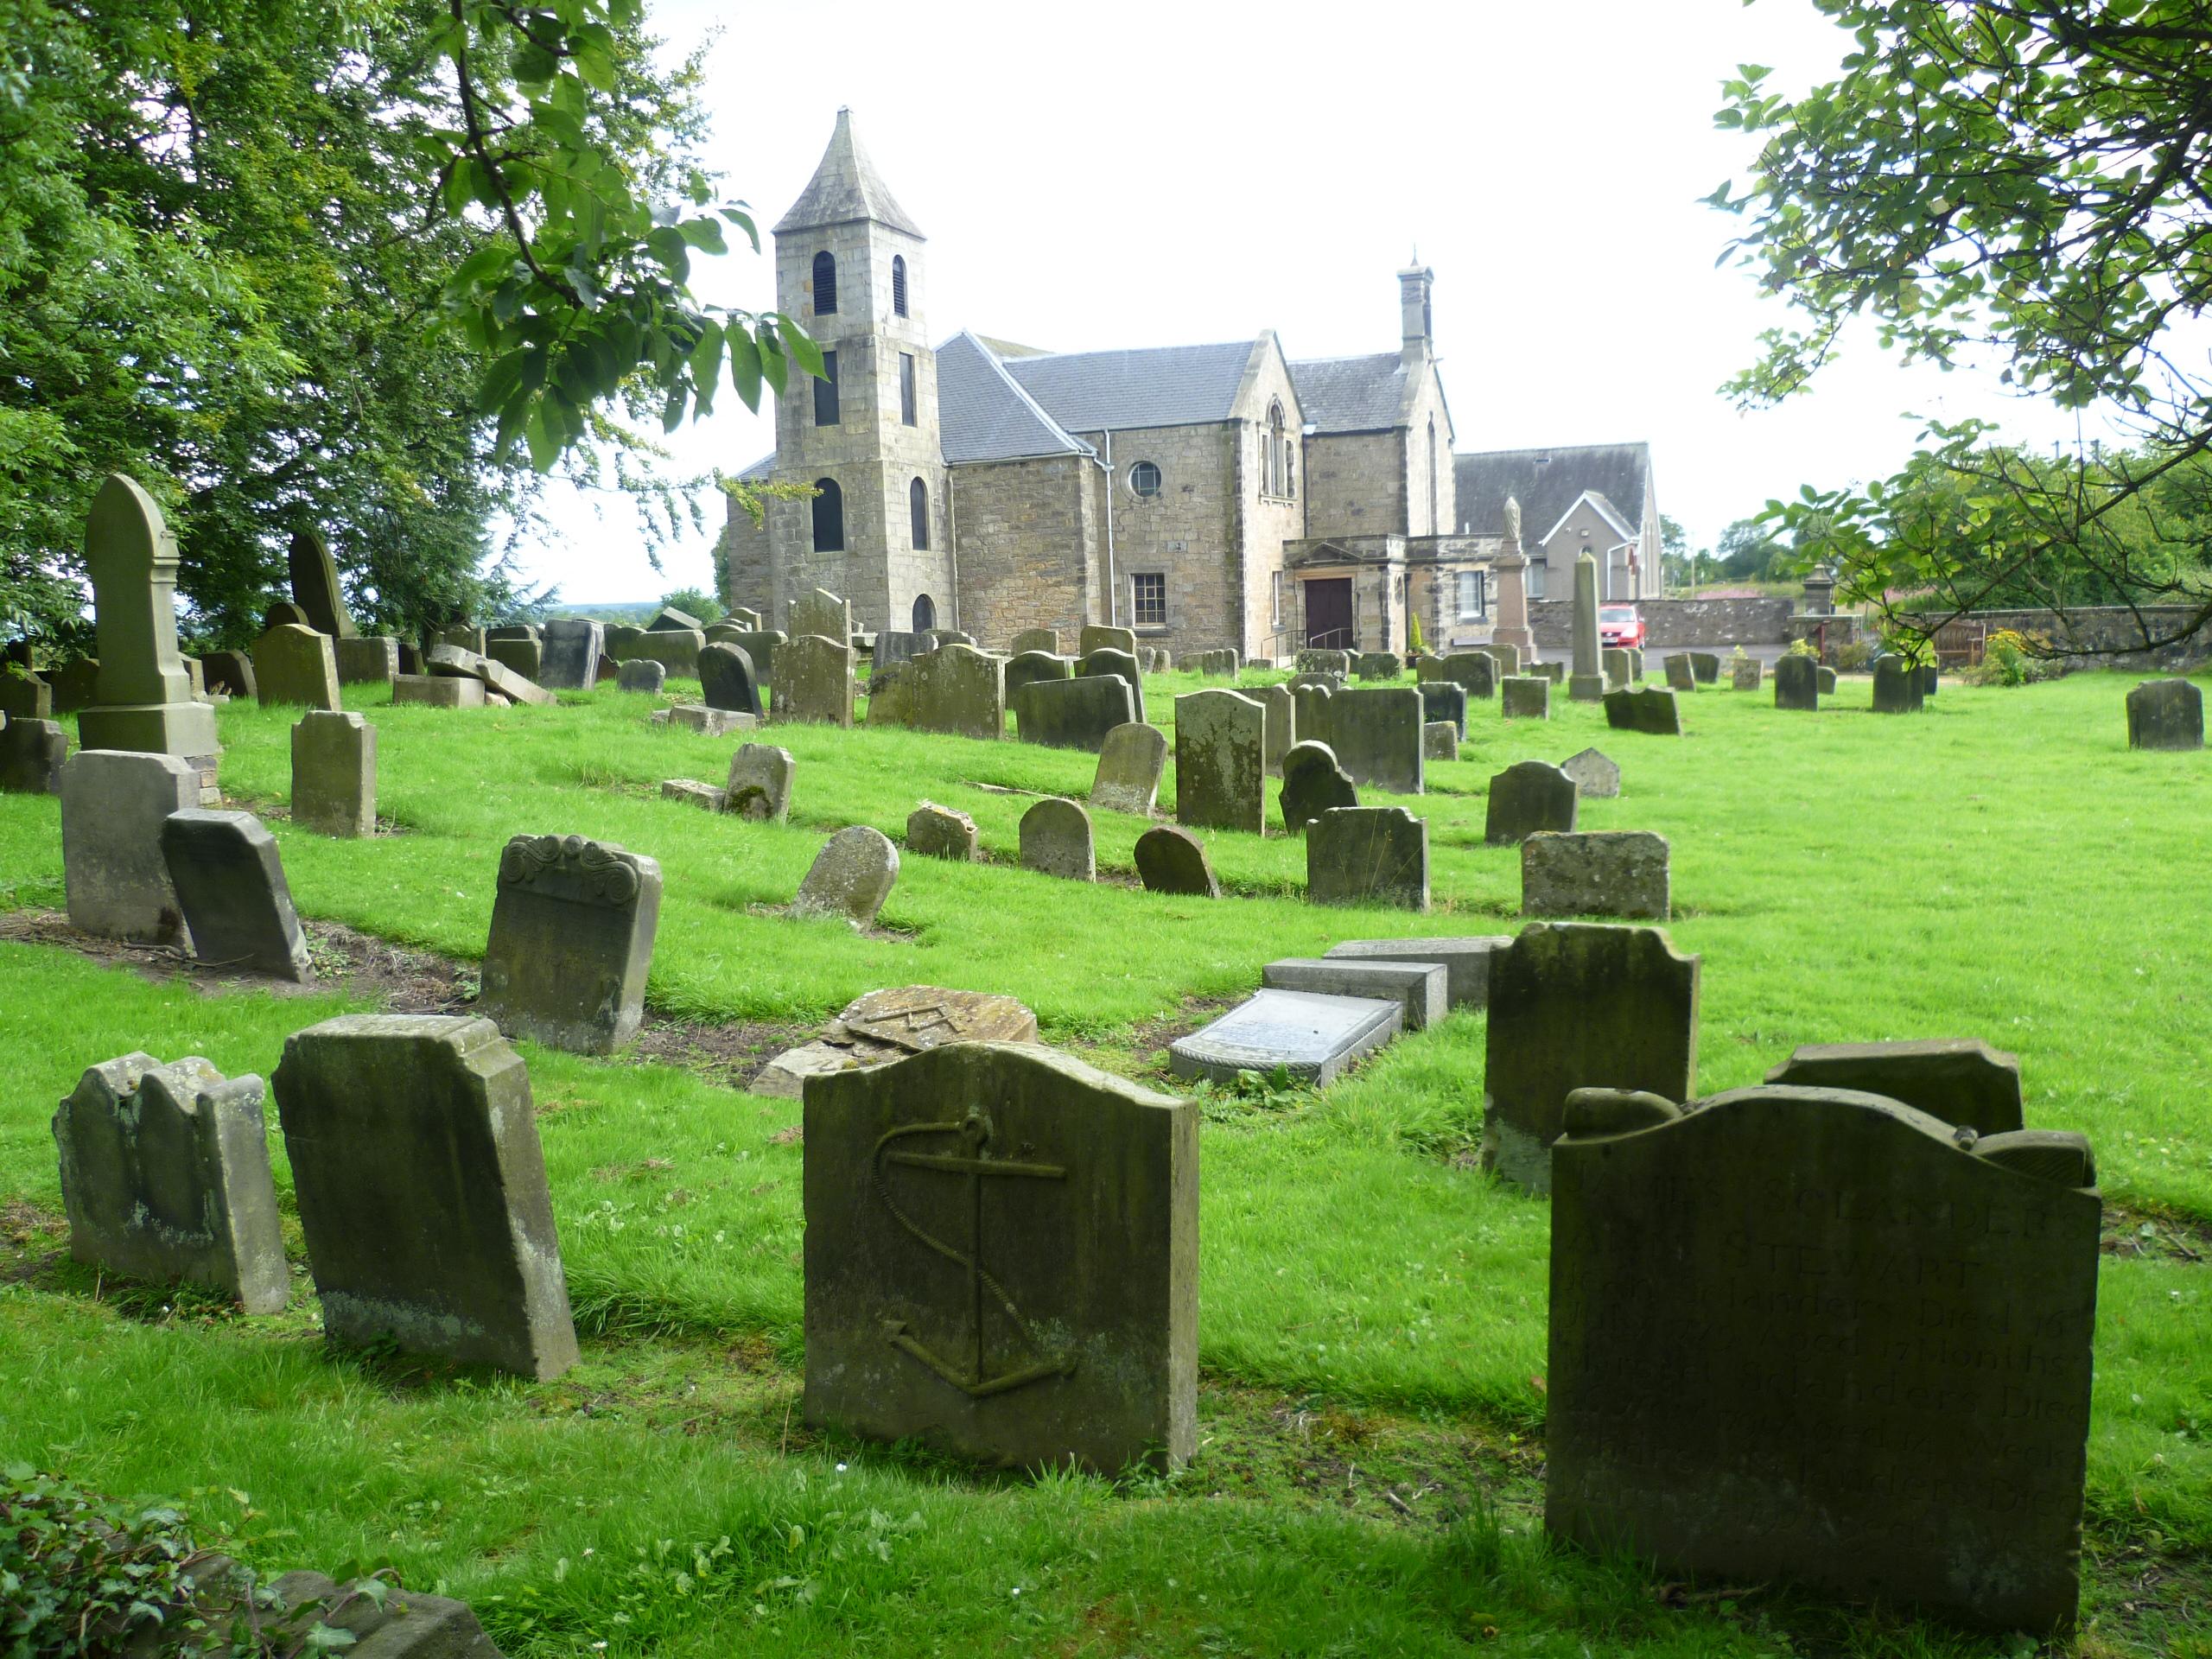 File:Bothkennar Parish Church and Churchyard.JPG - Wikimedia Commons